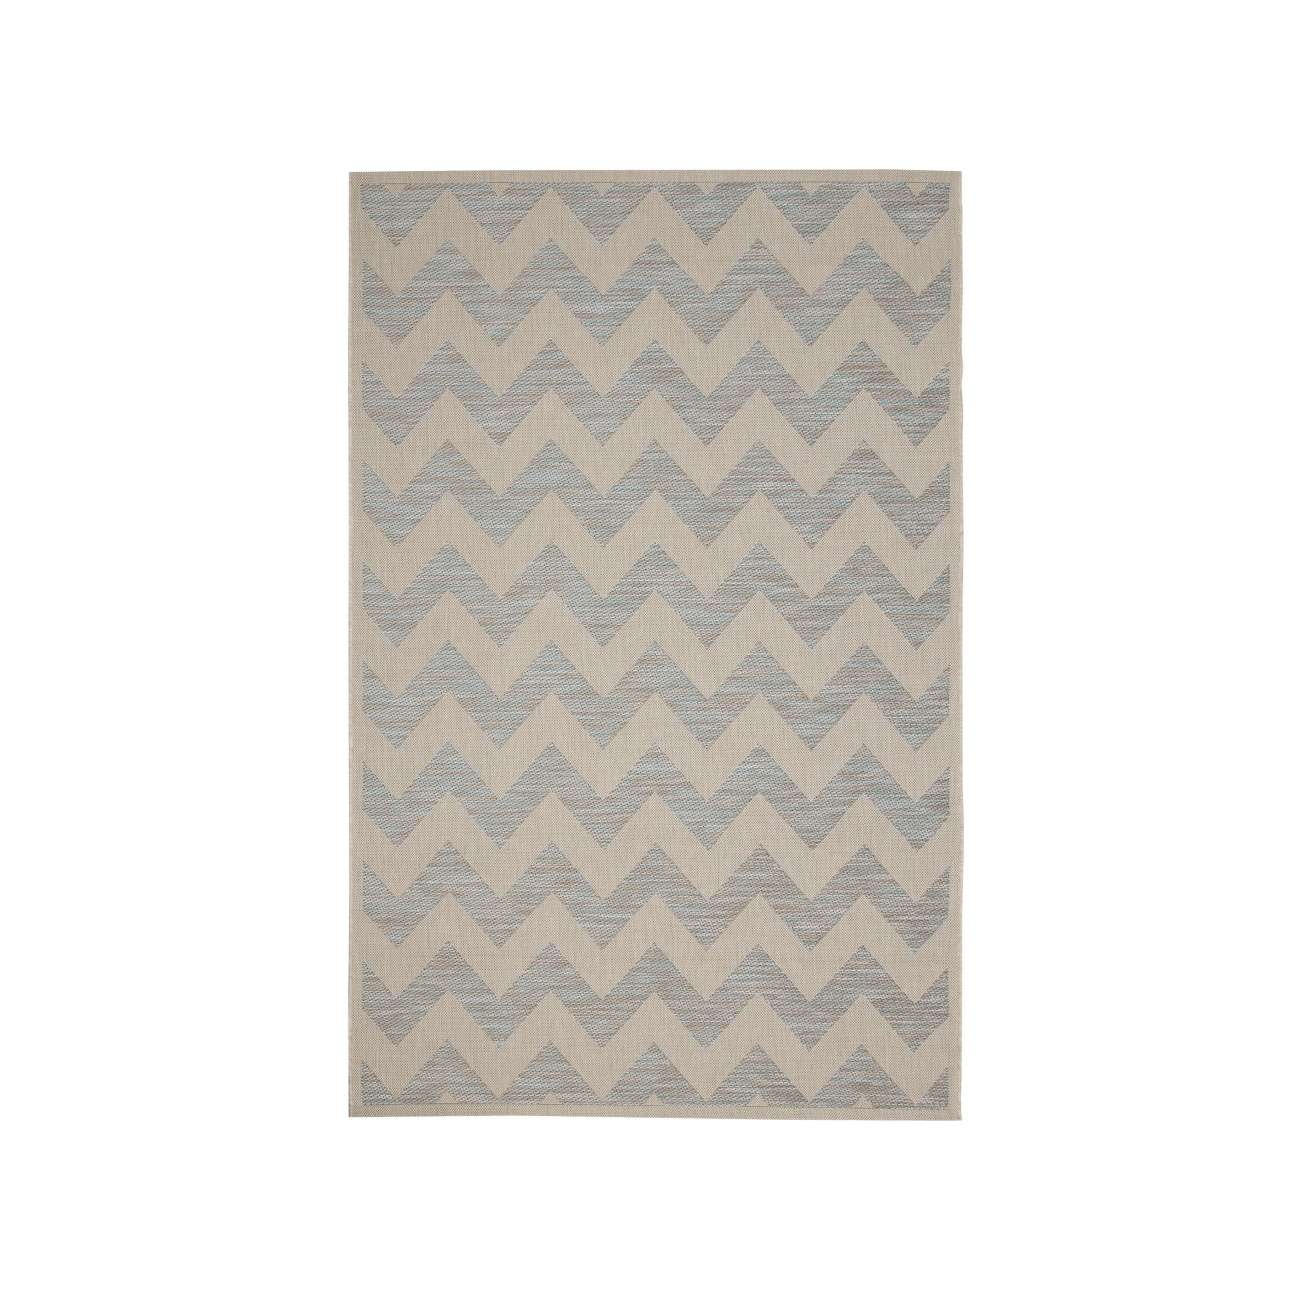 Koberec  Modern Chevron wool/ ice blue 160x230 cm